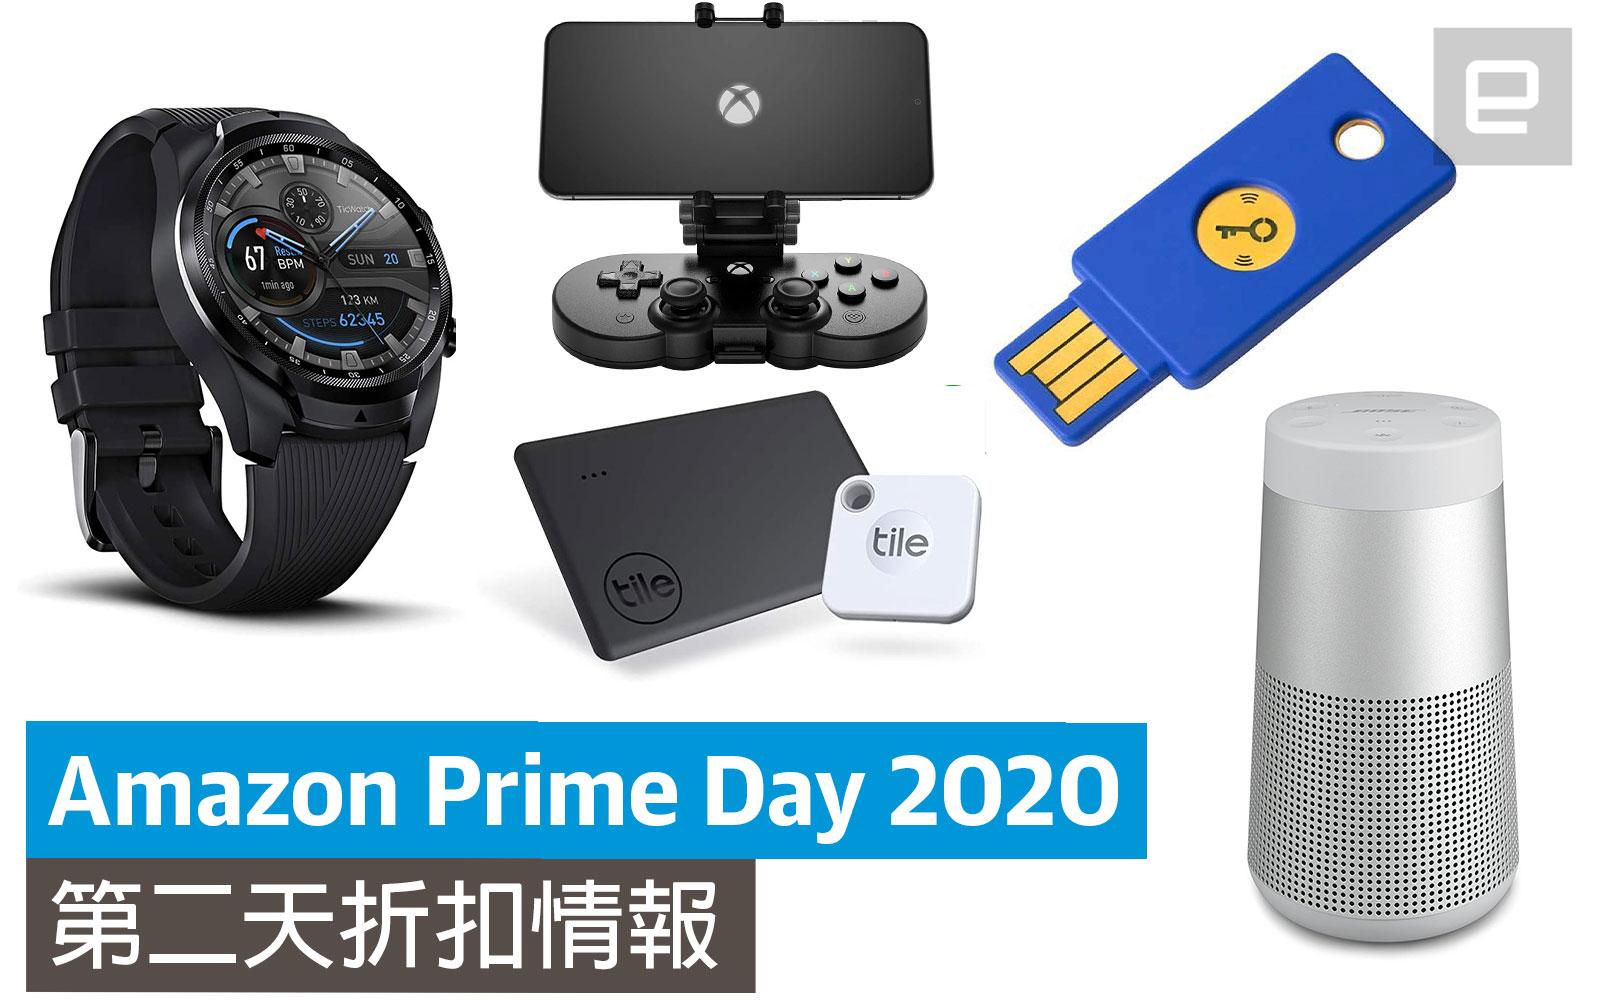 Amazon Prime Day 2